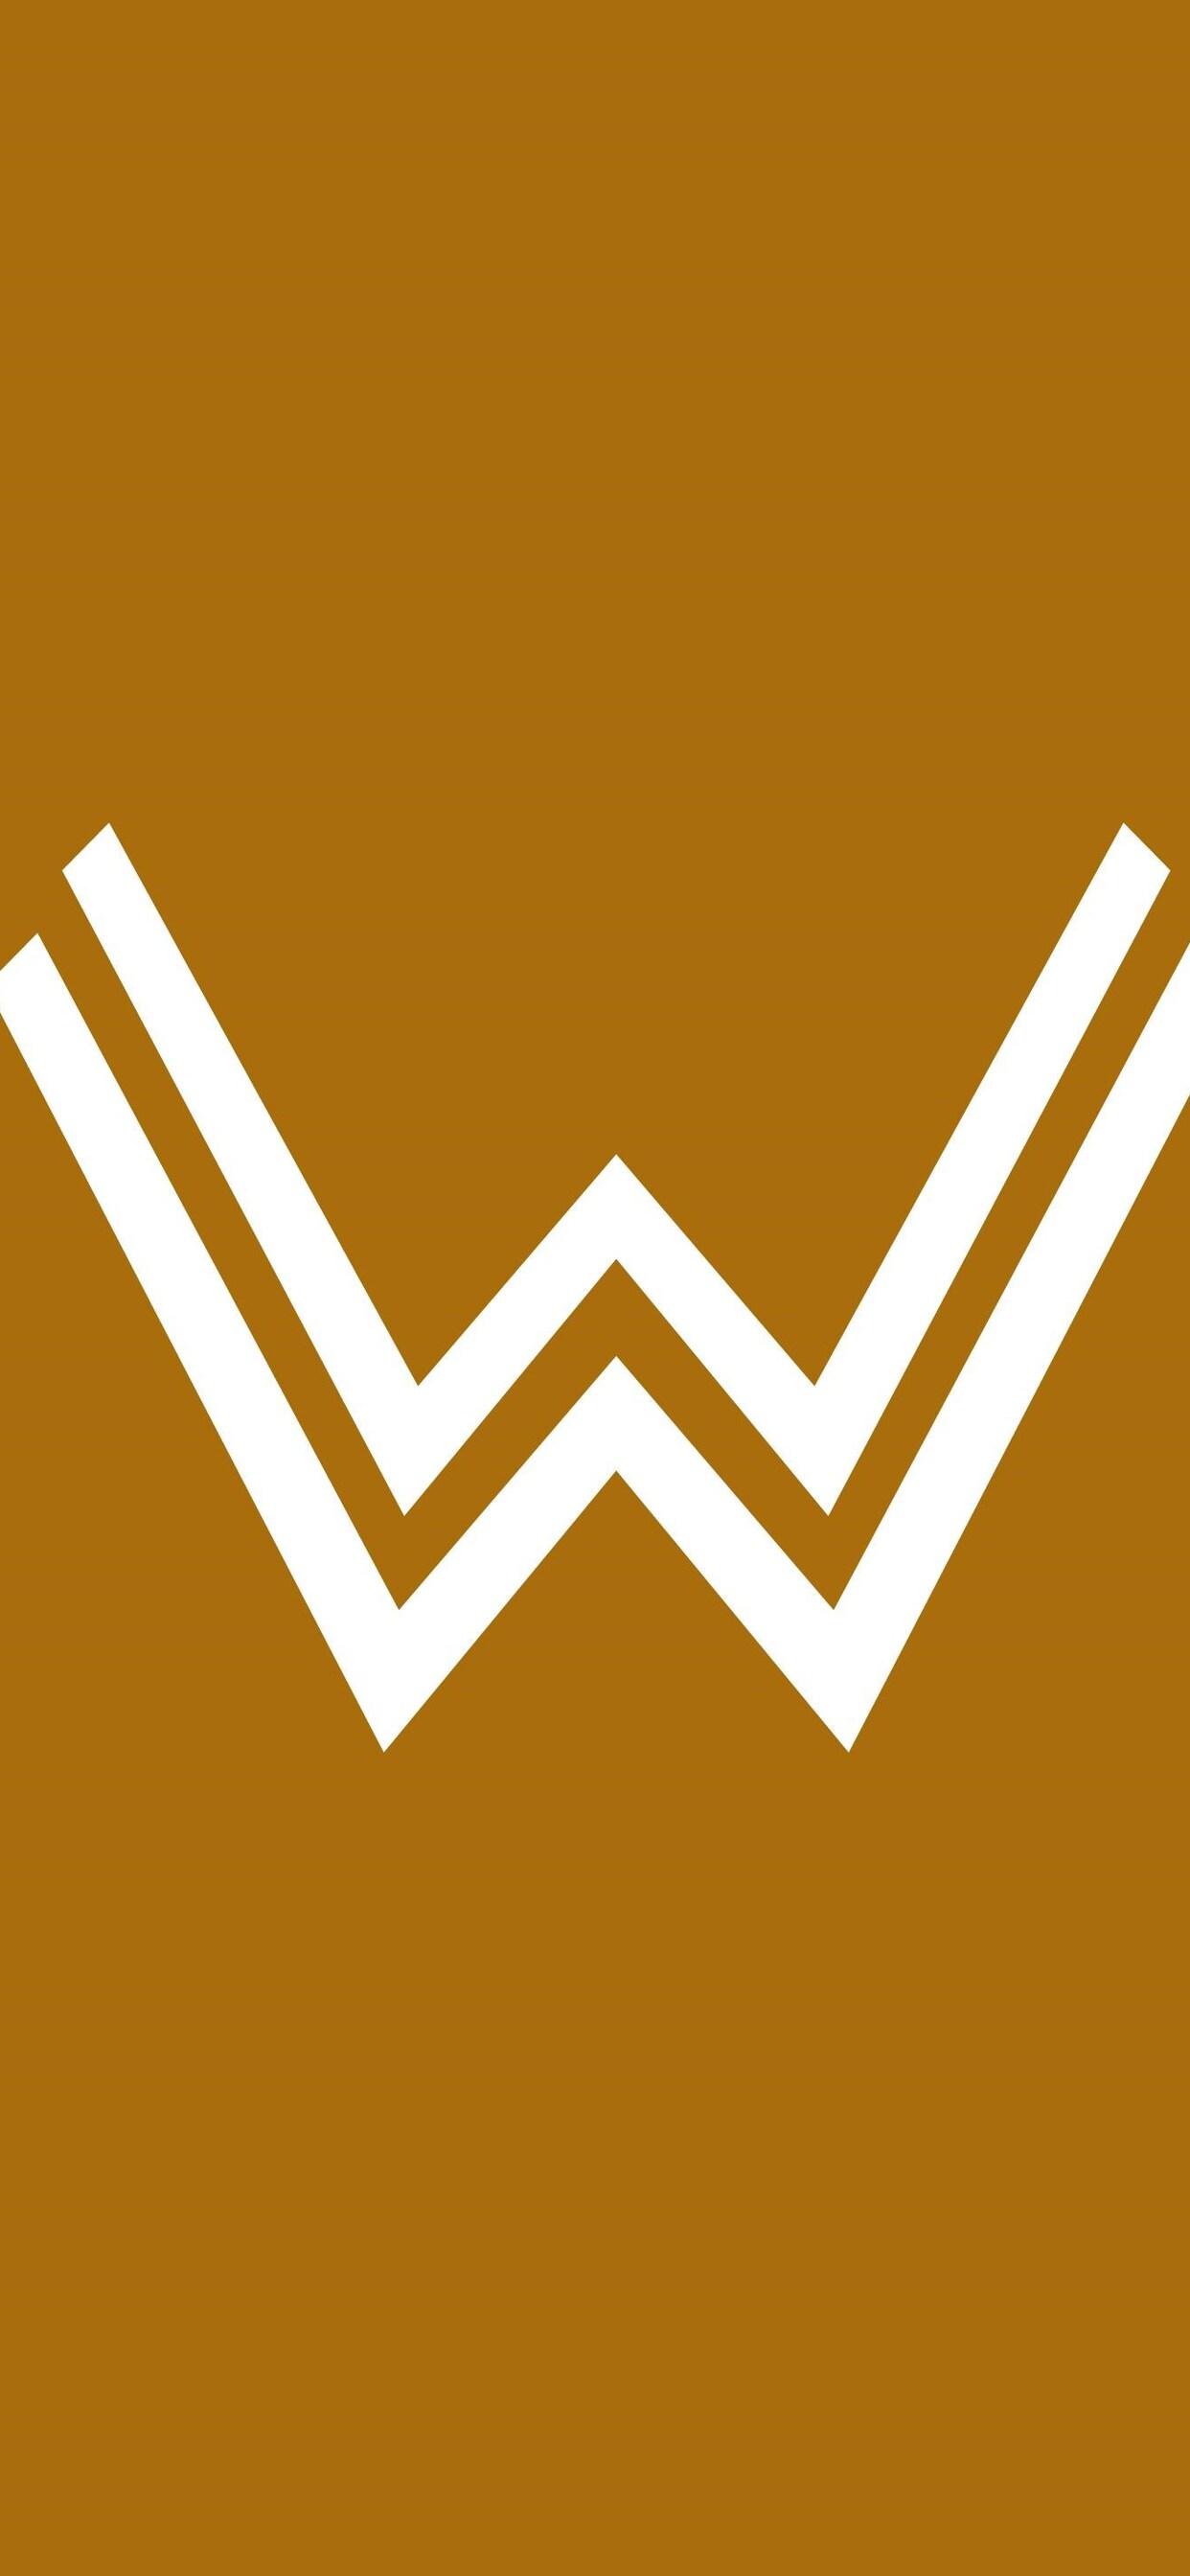 wonder-woman-minimalism-logo-qhd.jpg